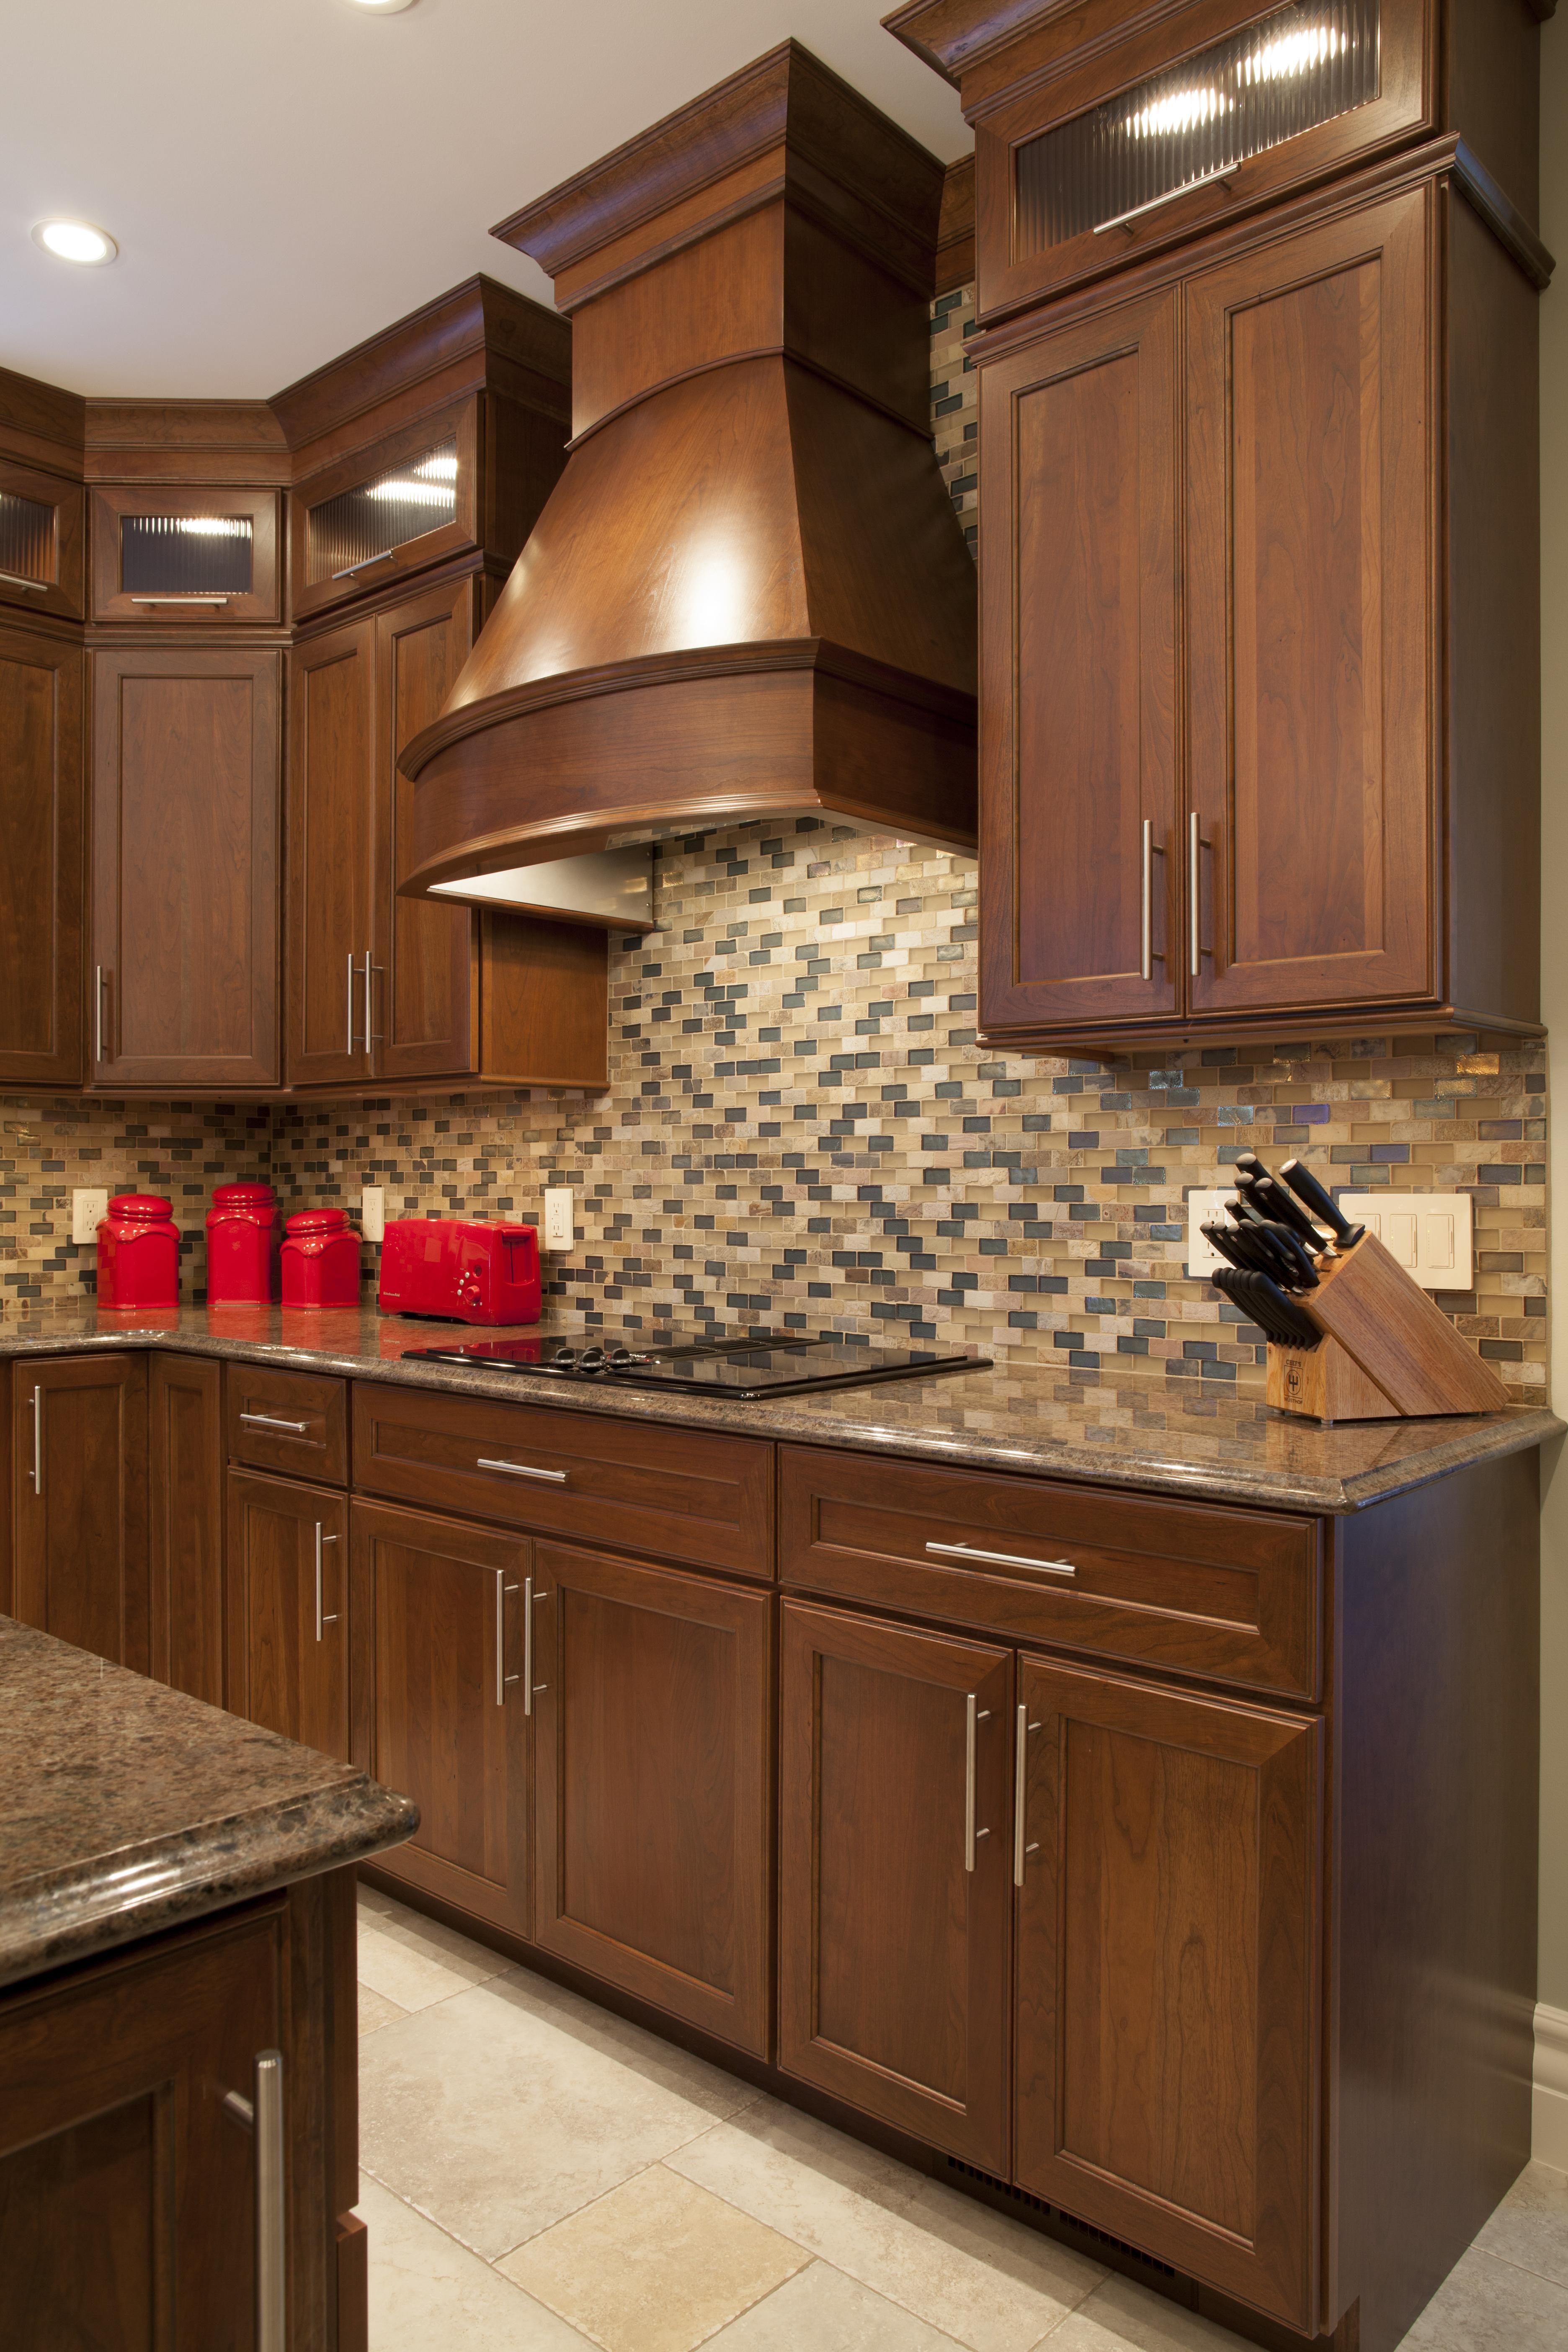 Mocha kitchen cabinets